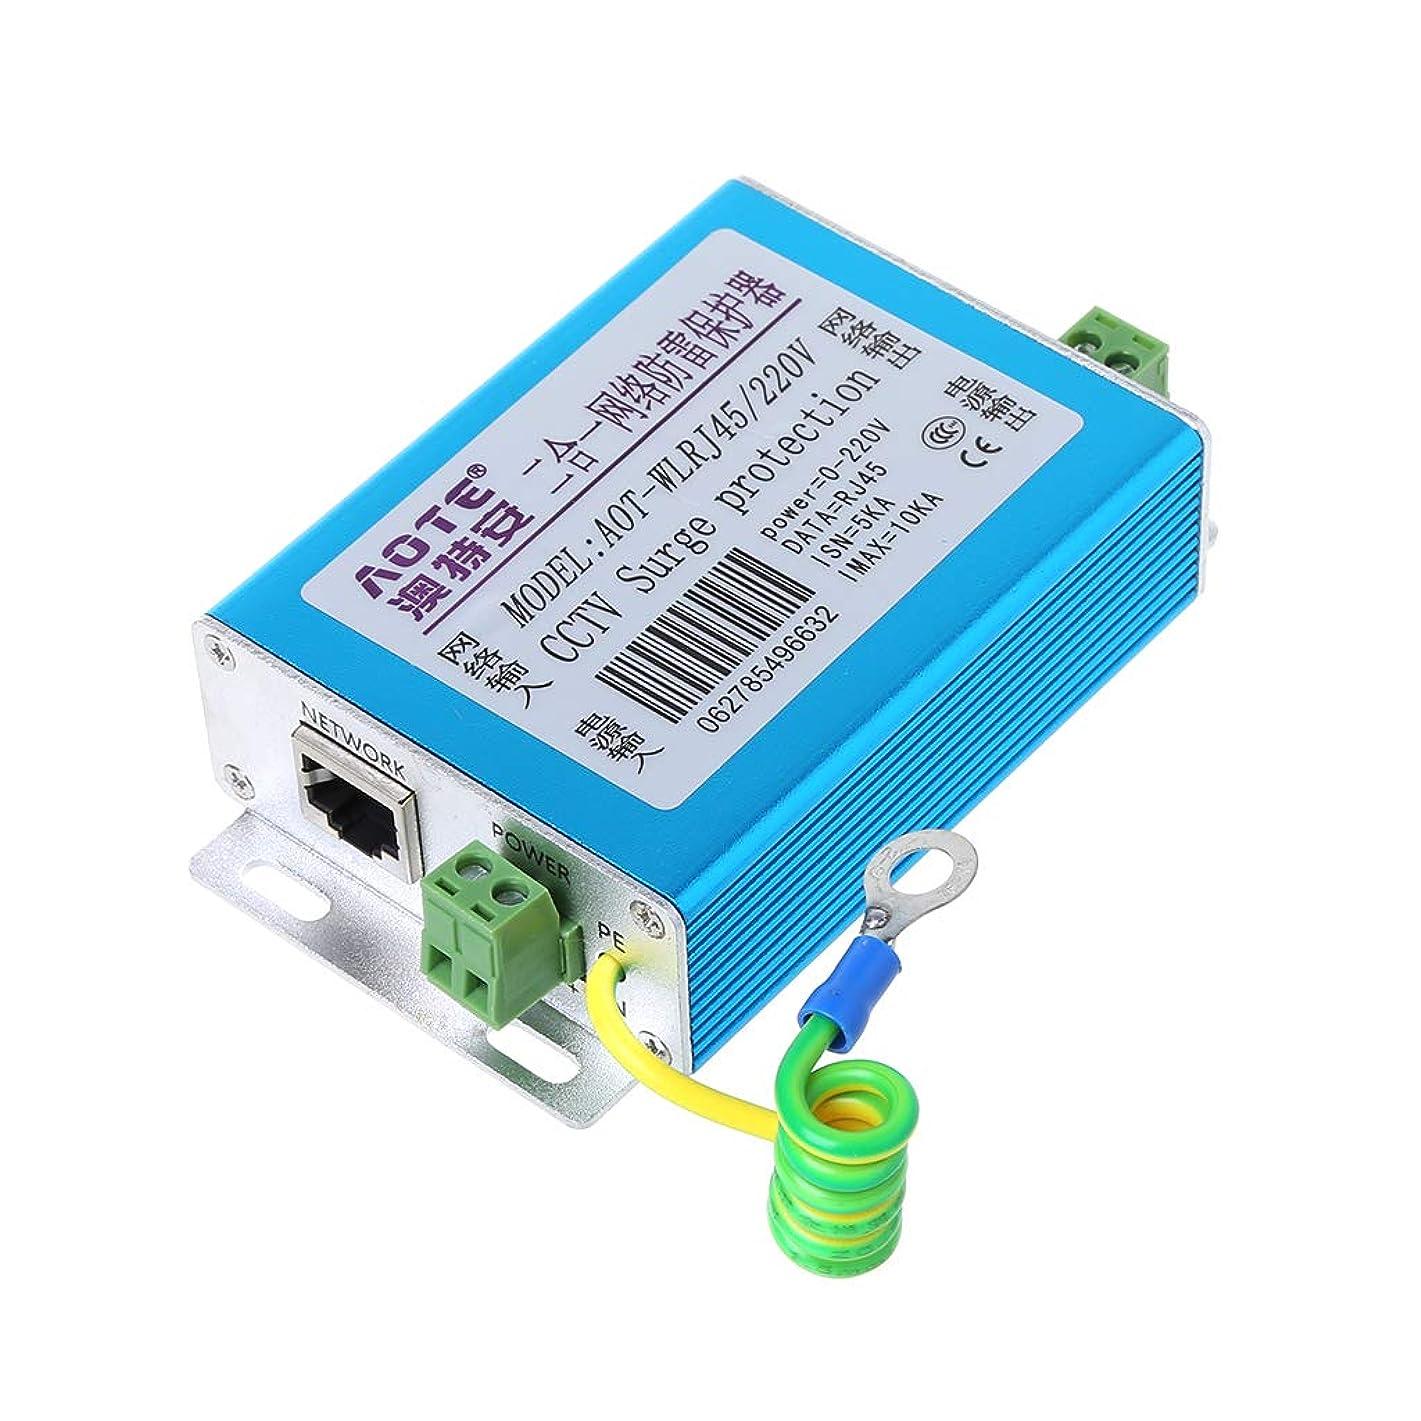 Yeahii Ethernet Network Power RJ45 Surge Protector Lightning Arrester Switch Camera SPD